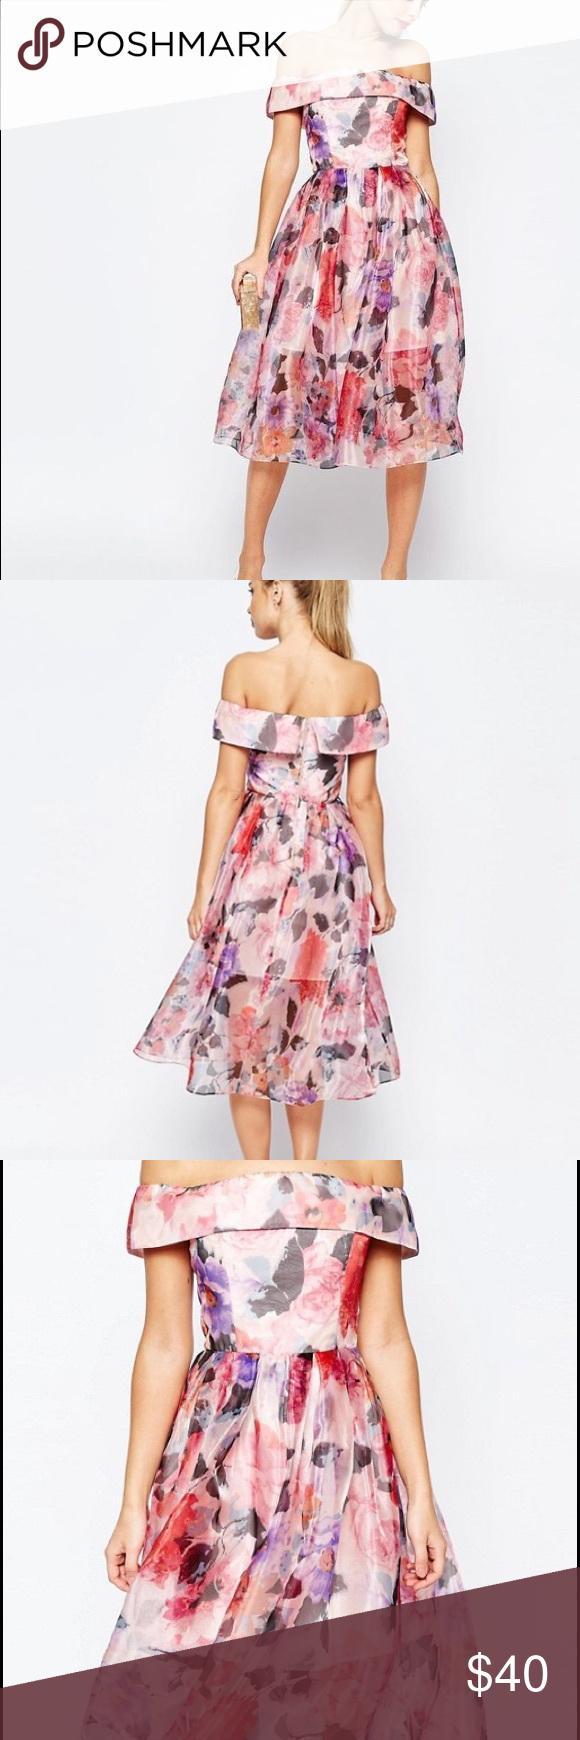 NWOT Asos salon floral midi prom dress NWT